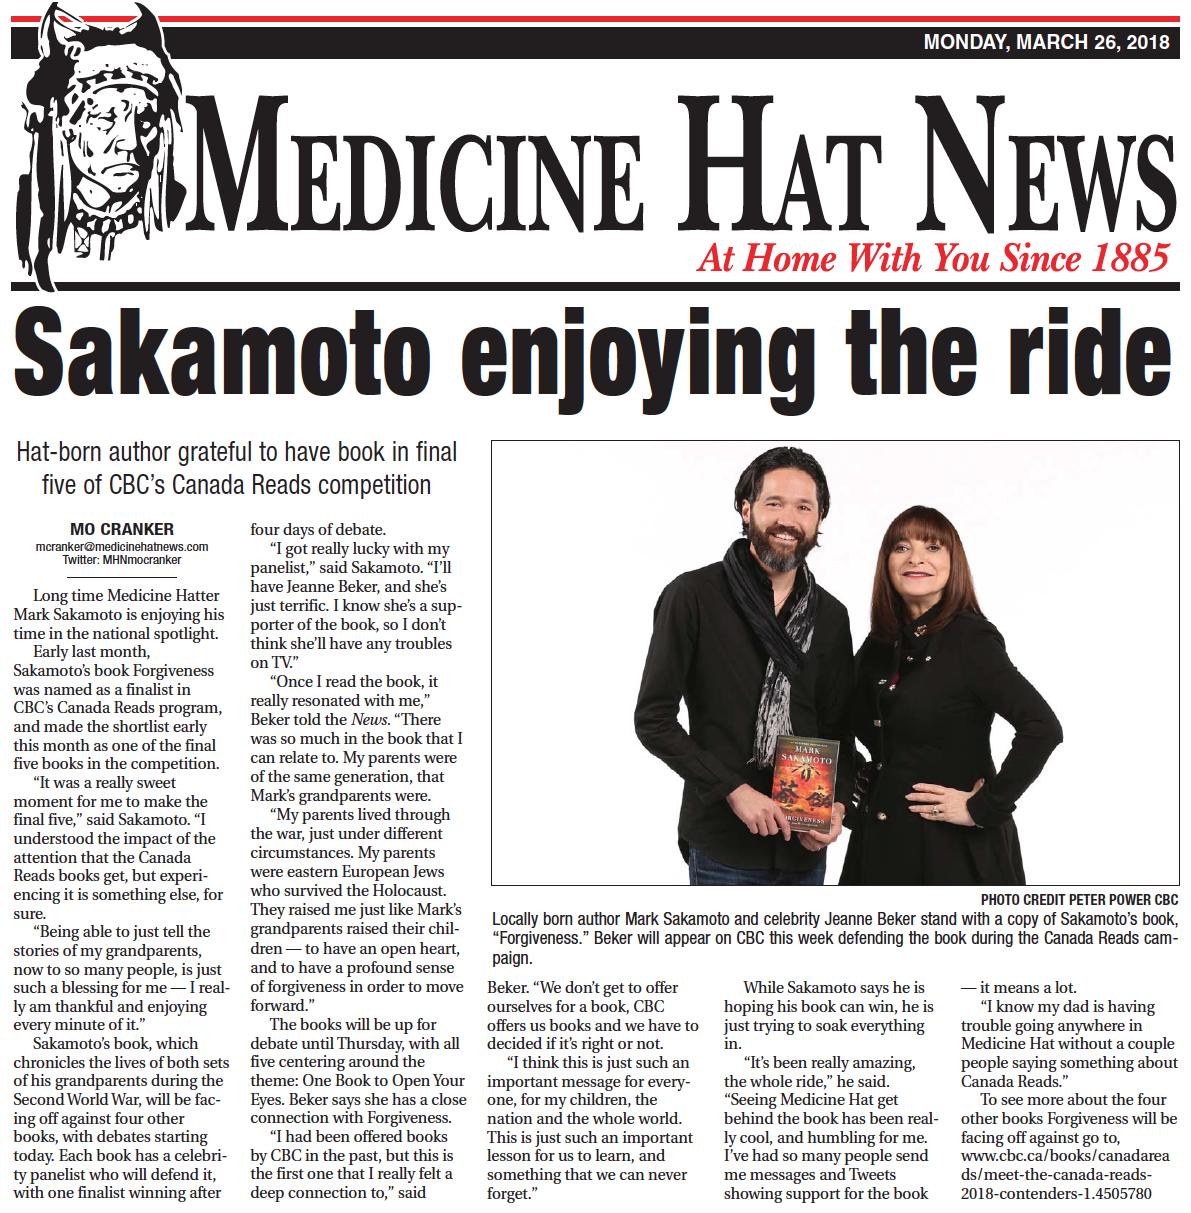 Medicine Hat News,  March 26, 2018